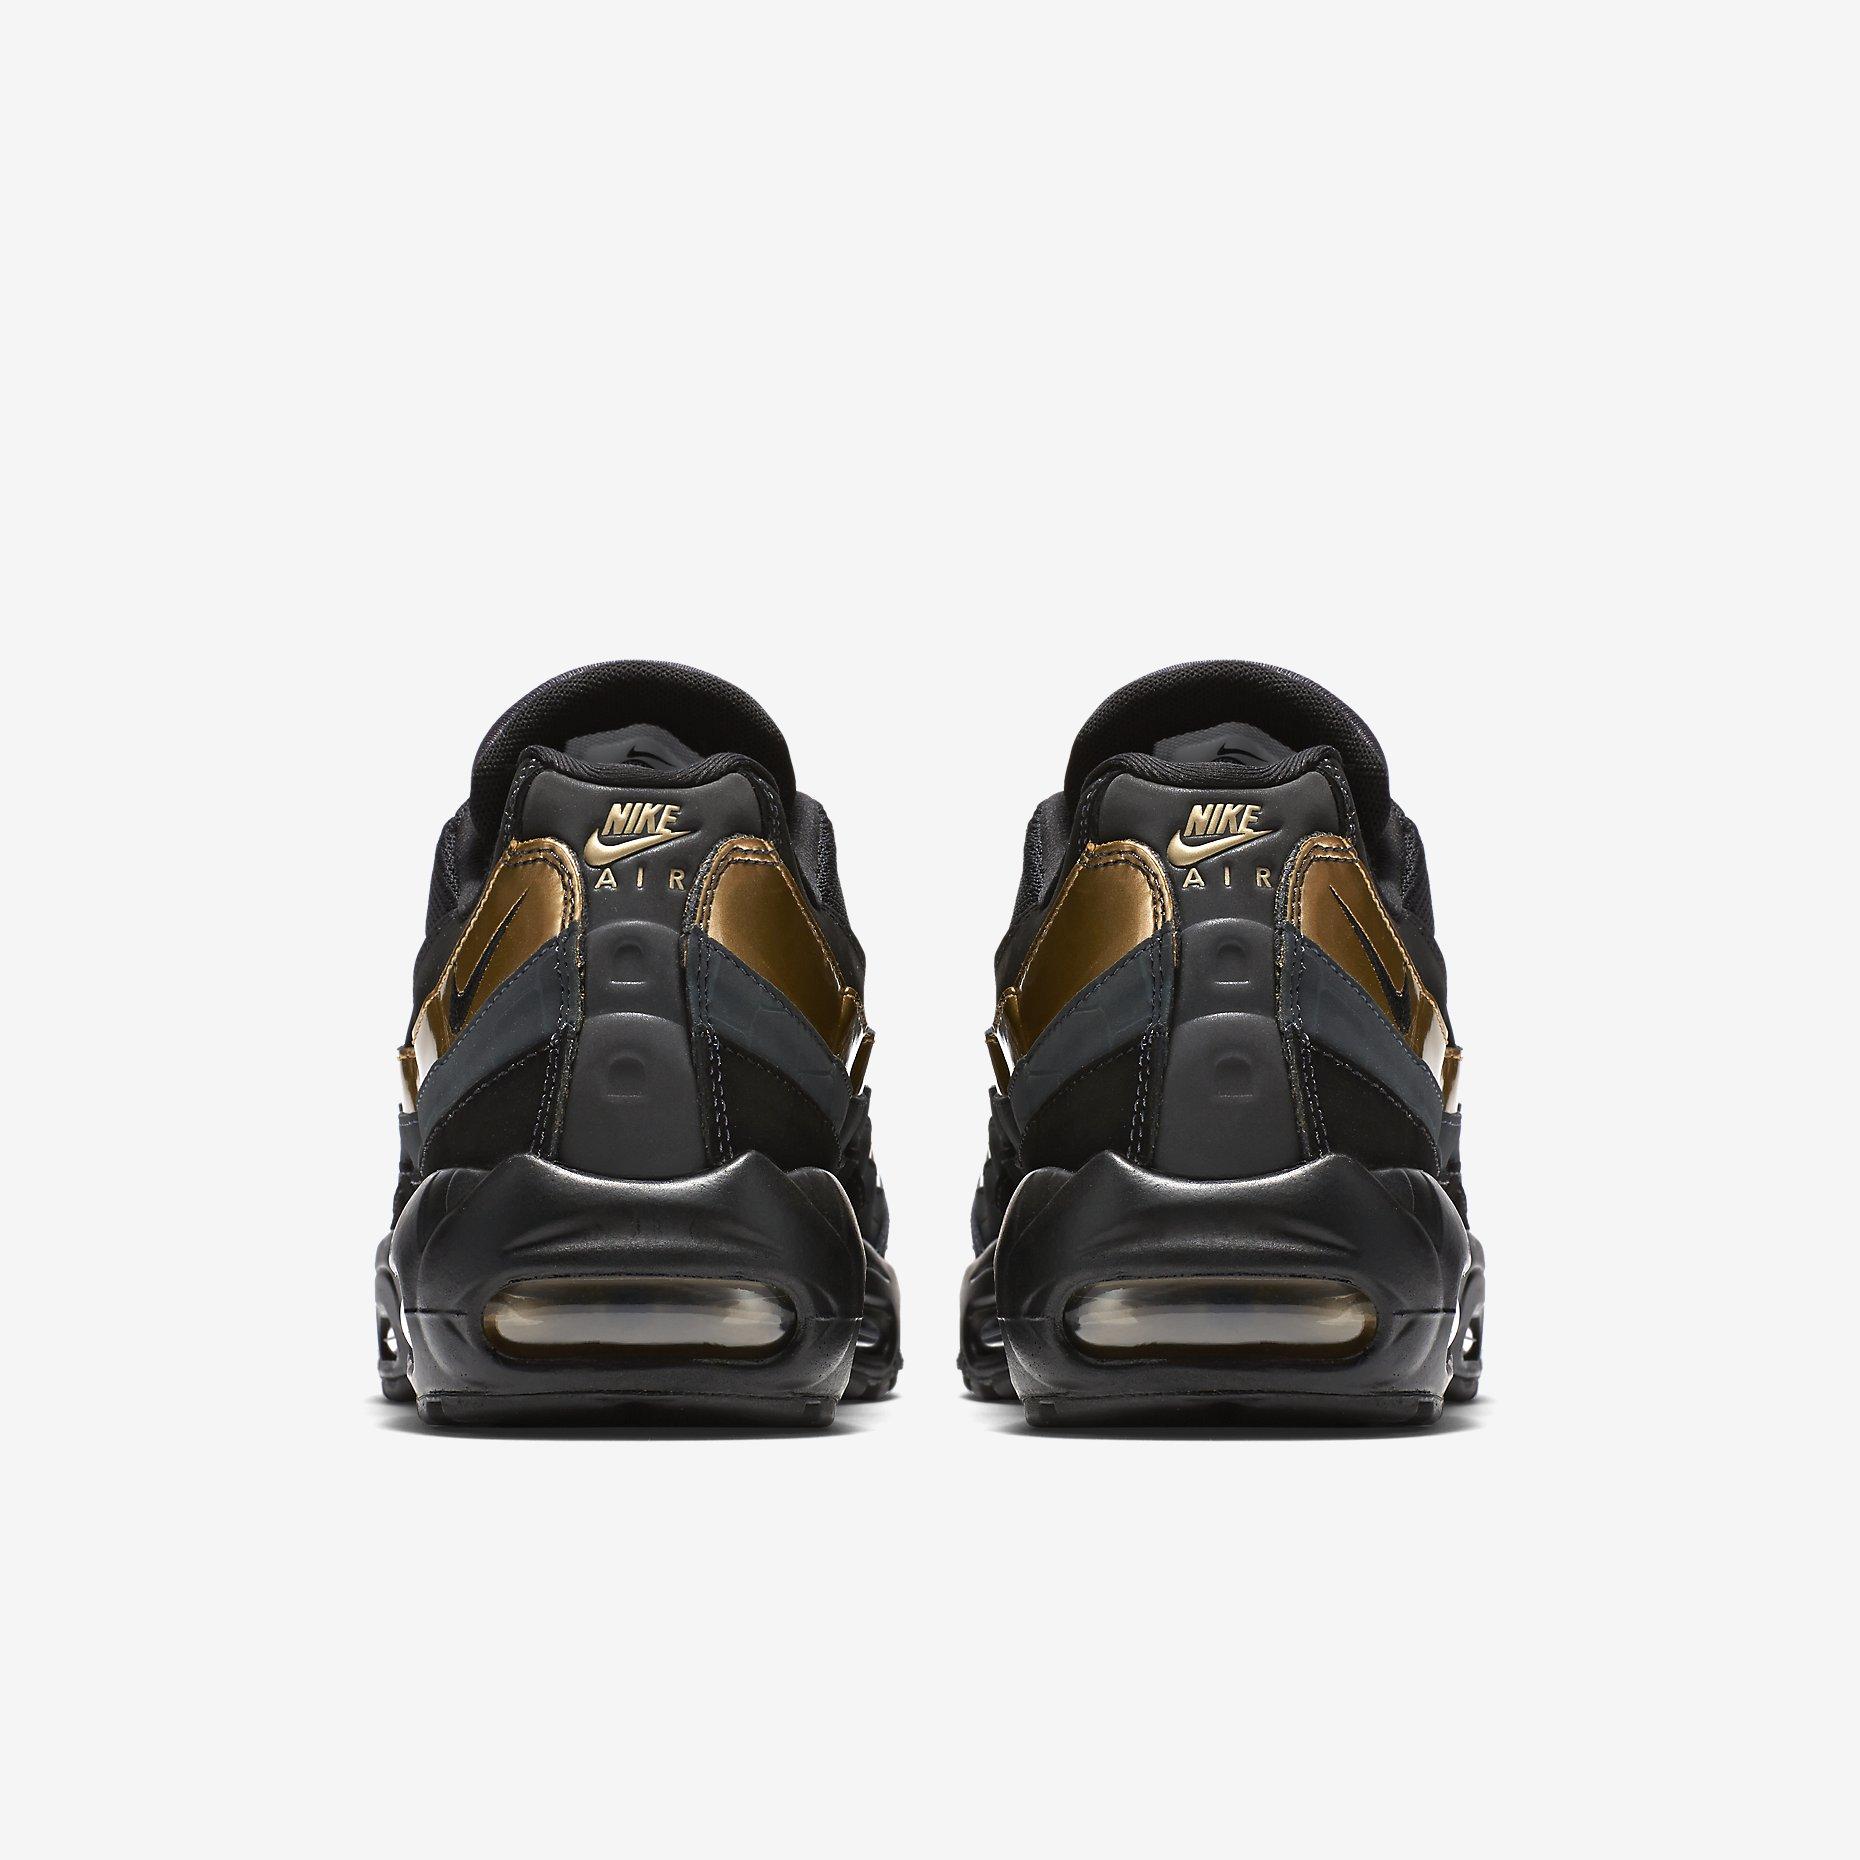 538416-007-air-max-95-bronze2